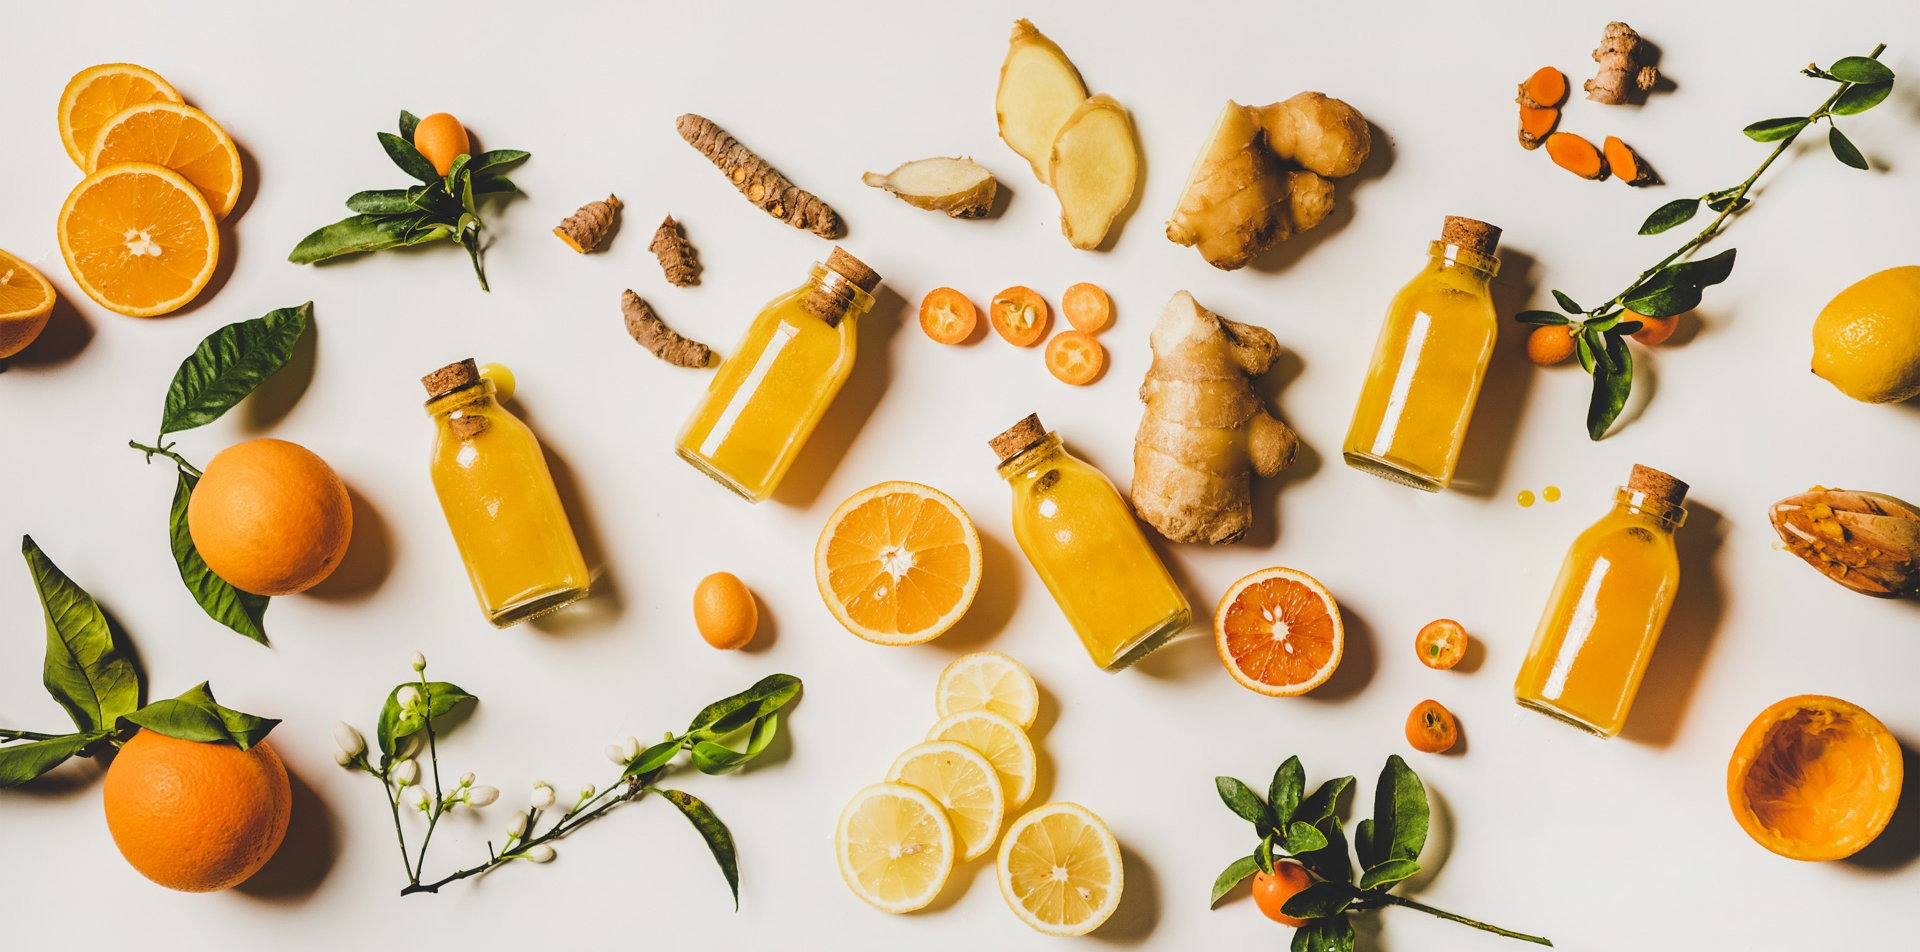 imbir marchewka cytryna pomarańcza miód